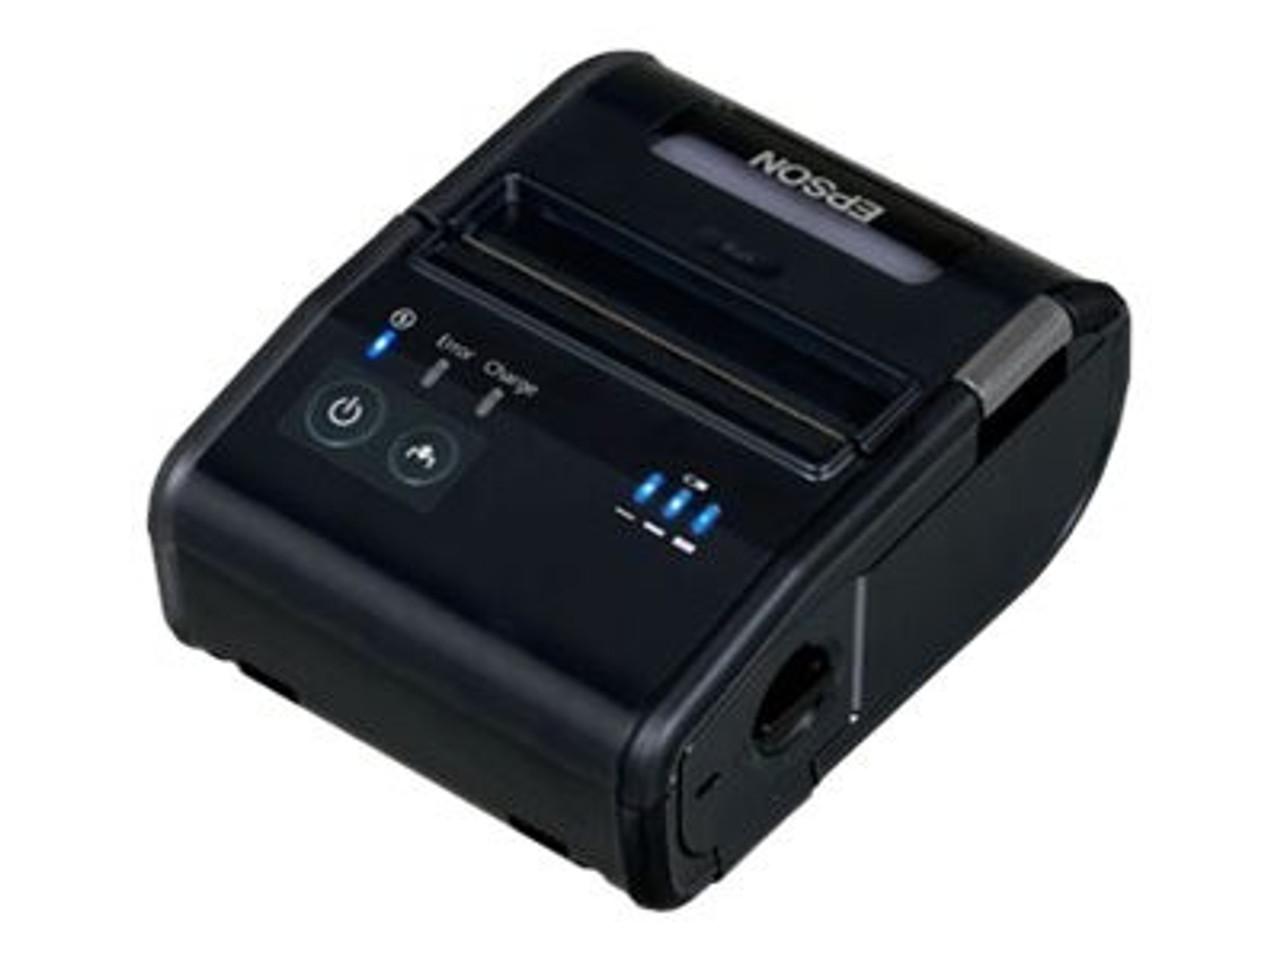 Epson P80 Mobile Printer